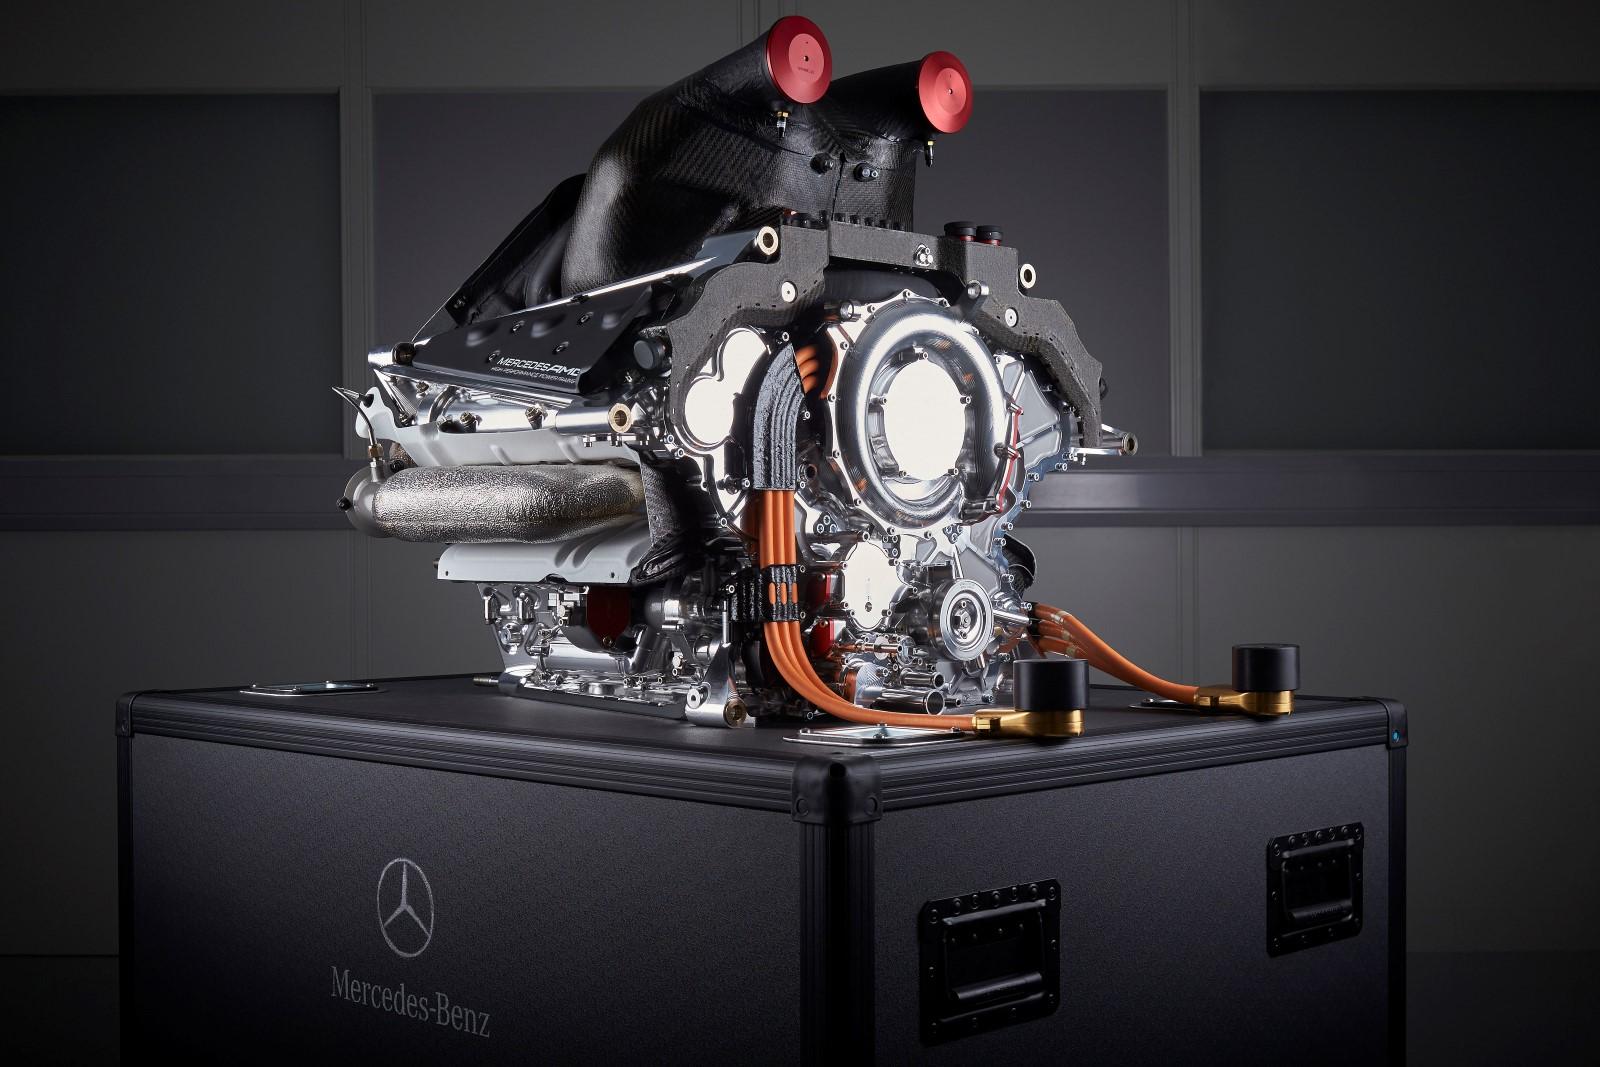 http://www.autoblog.gr/wp-content/gallery/mercedes-benz-pu106a-hybrid-dewar-trophy/Mercedes-Benz-PU106A-Hybrid-1.JPG